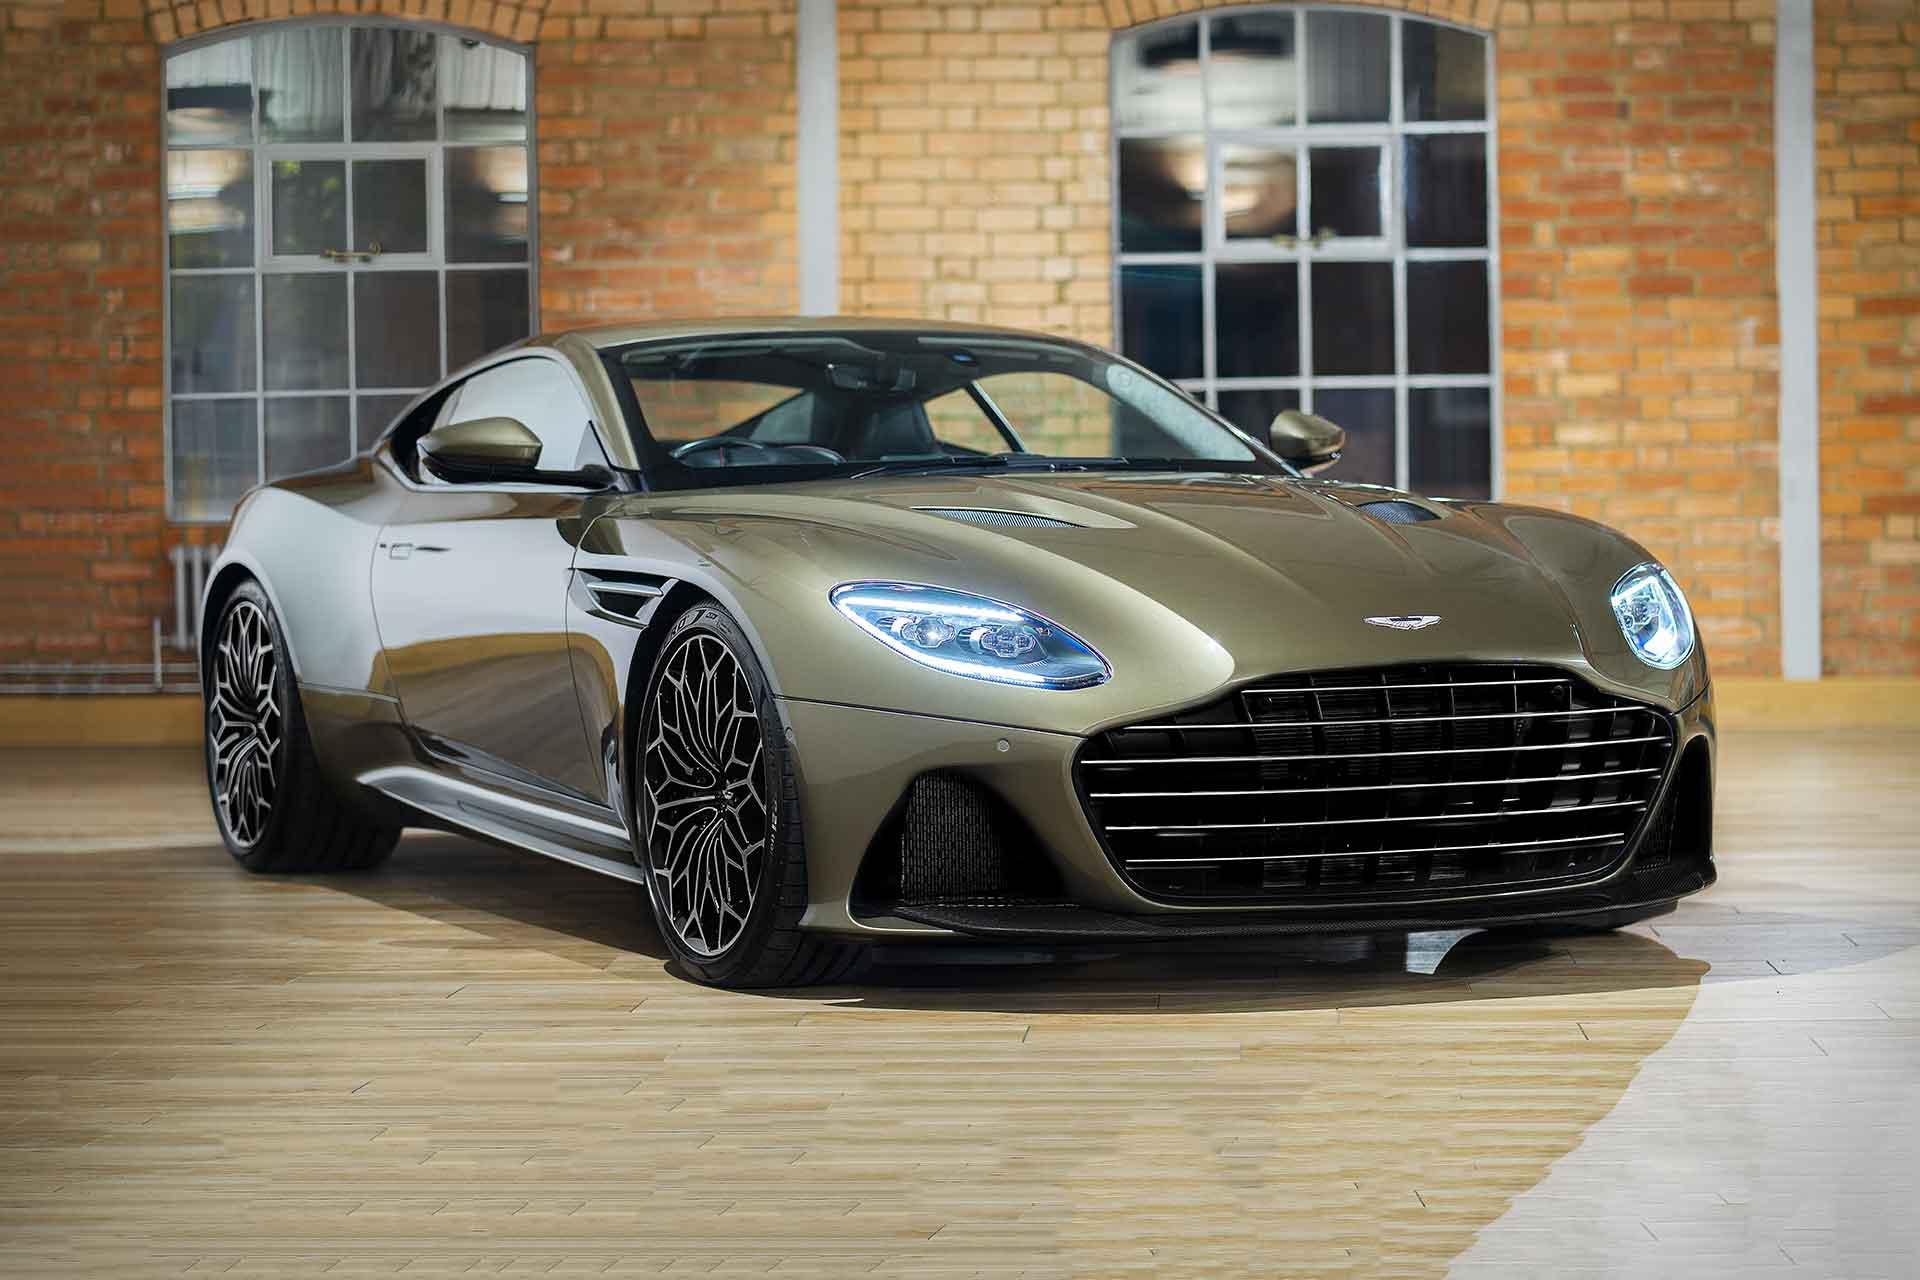 Aston Martin On Her Majesty's Secret Service DBS Superleggera Coupe